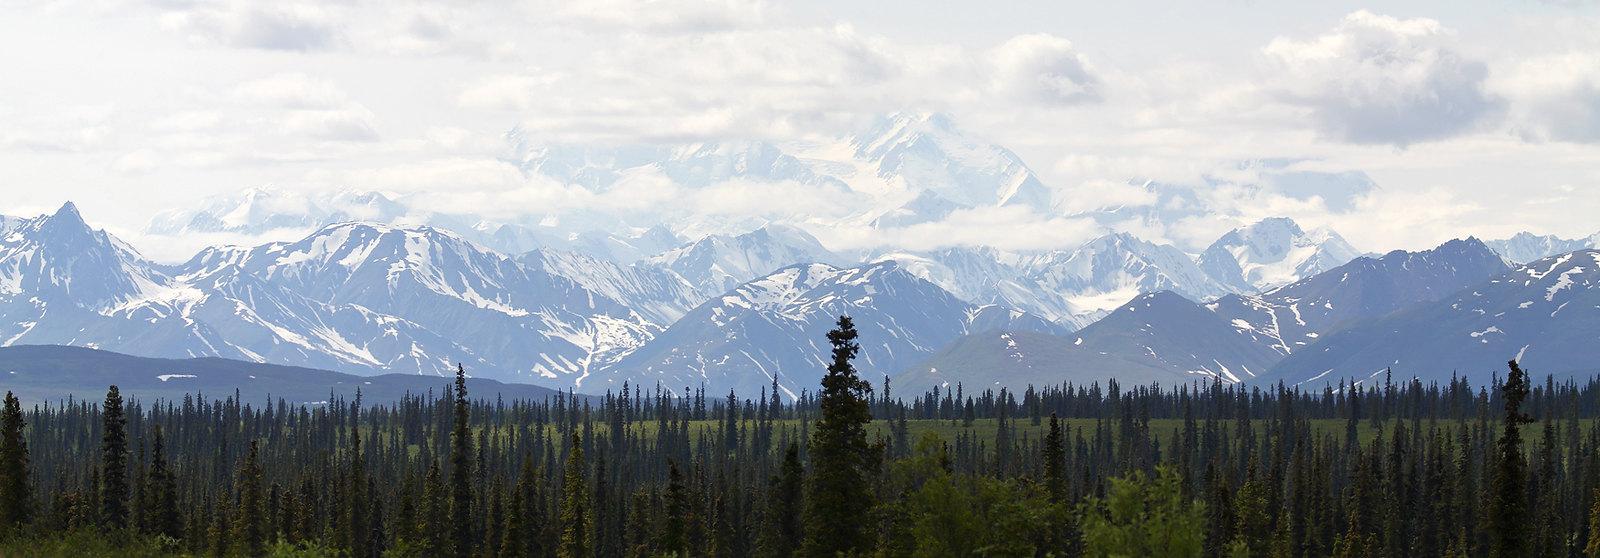 Mount Denali [McKinley]